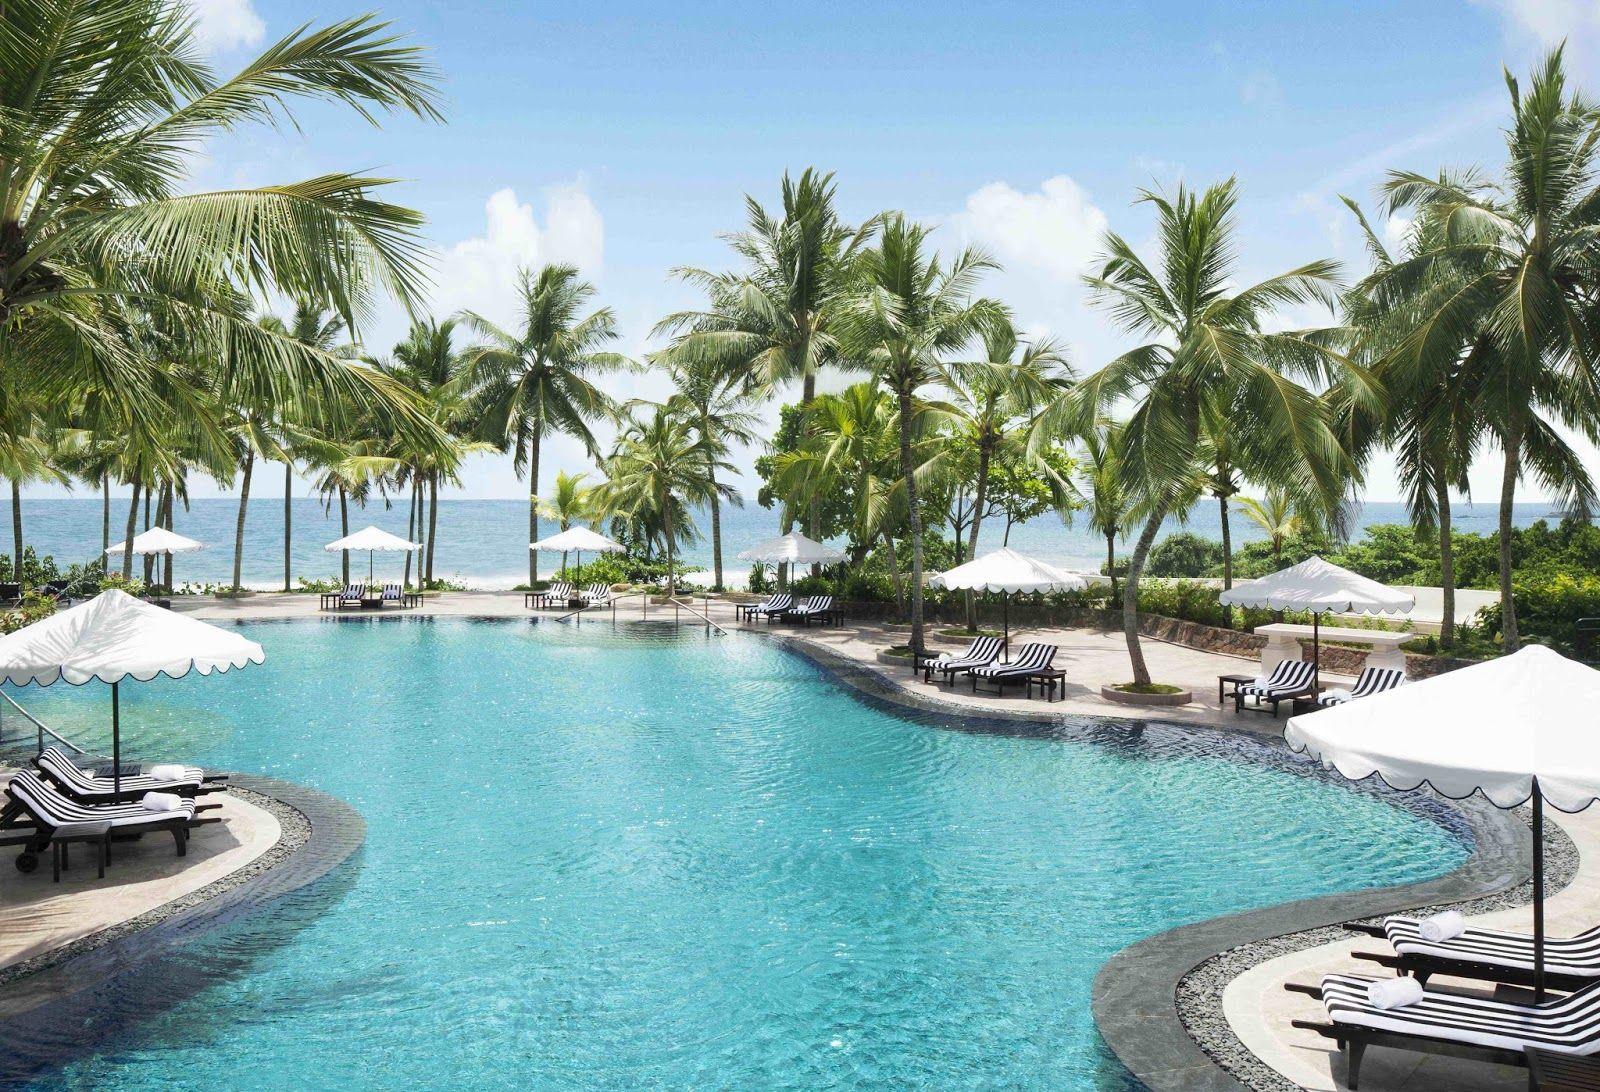 Deluxe Vacations Beach Five Star Hotels Sri Lanka